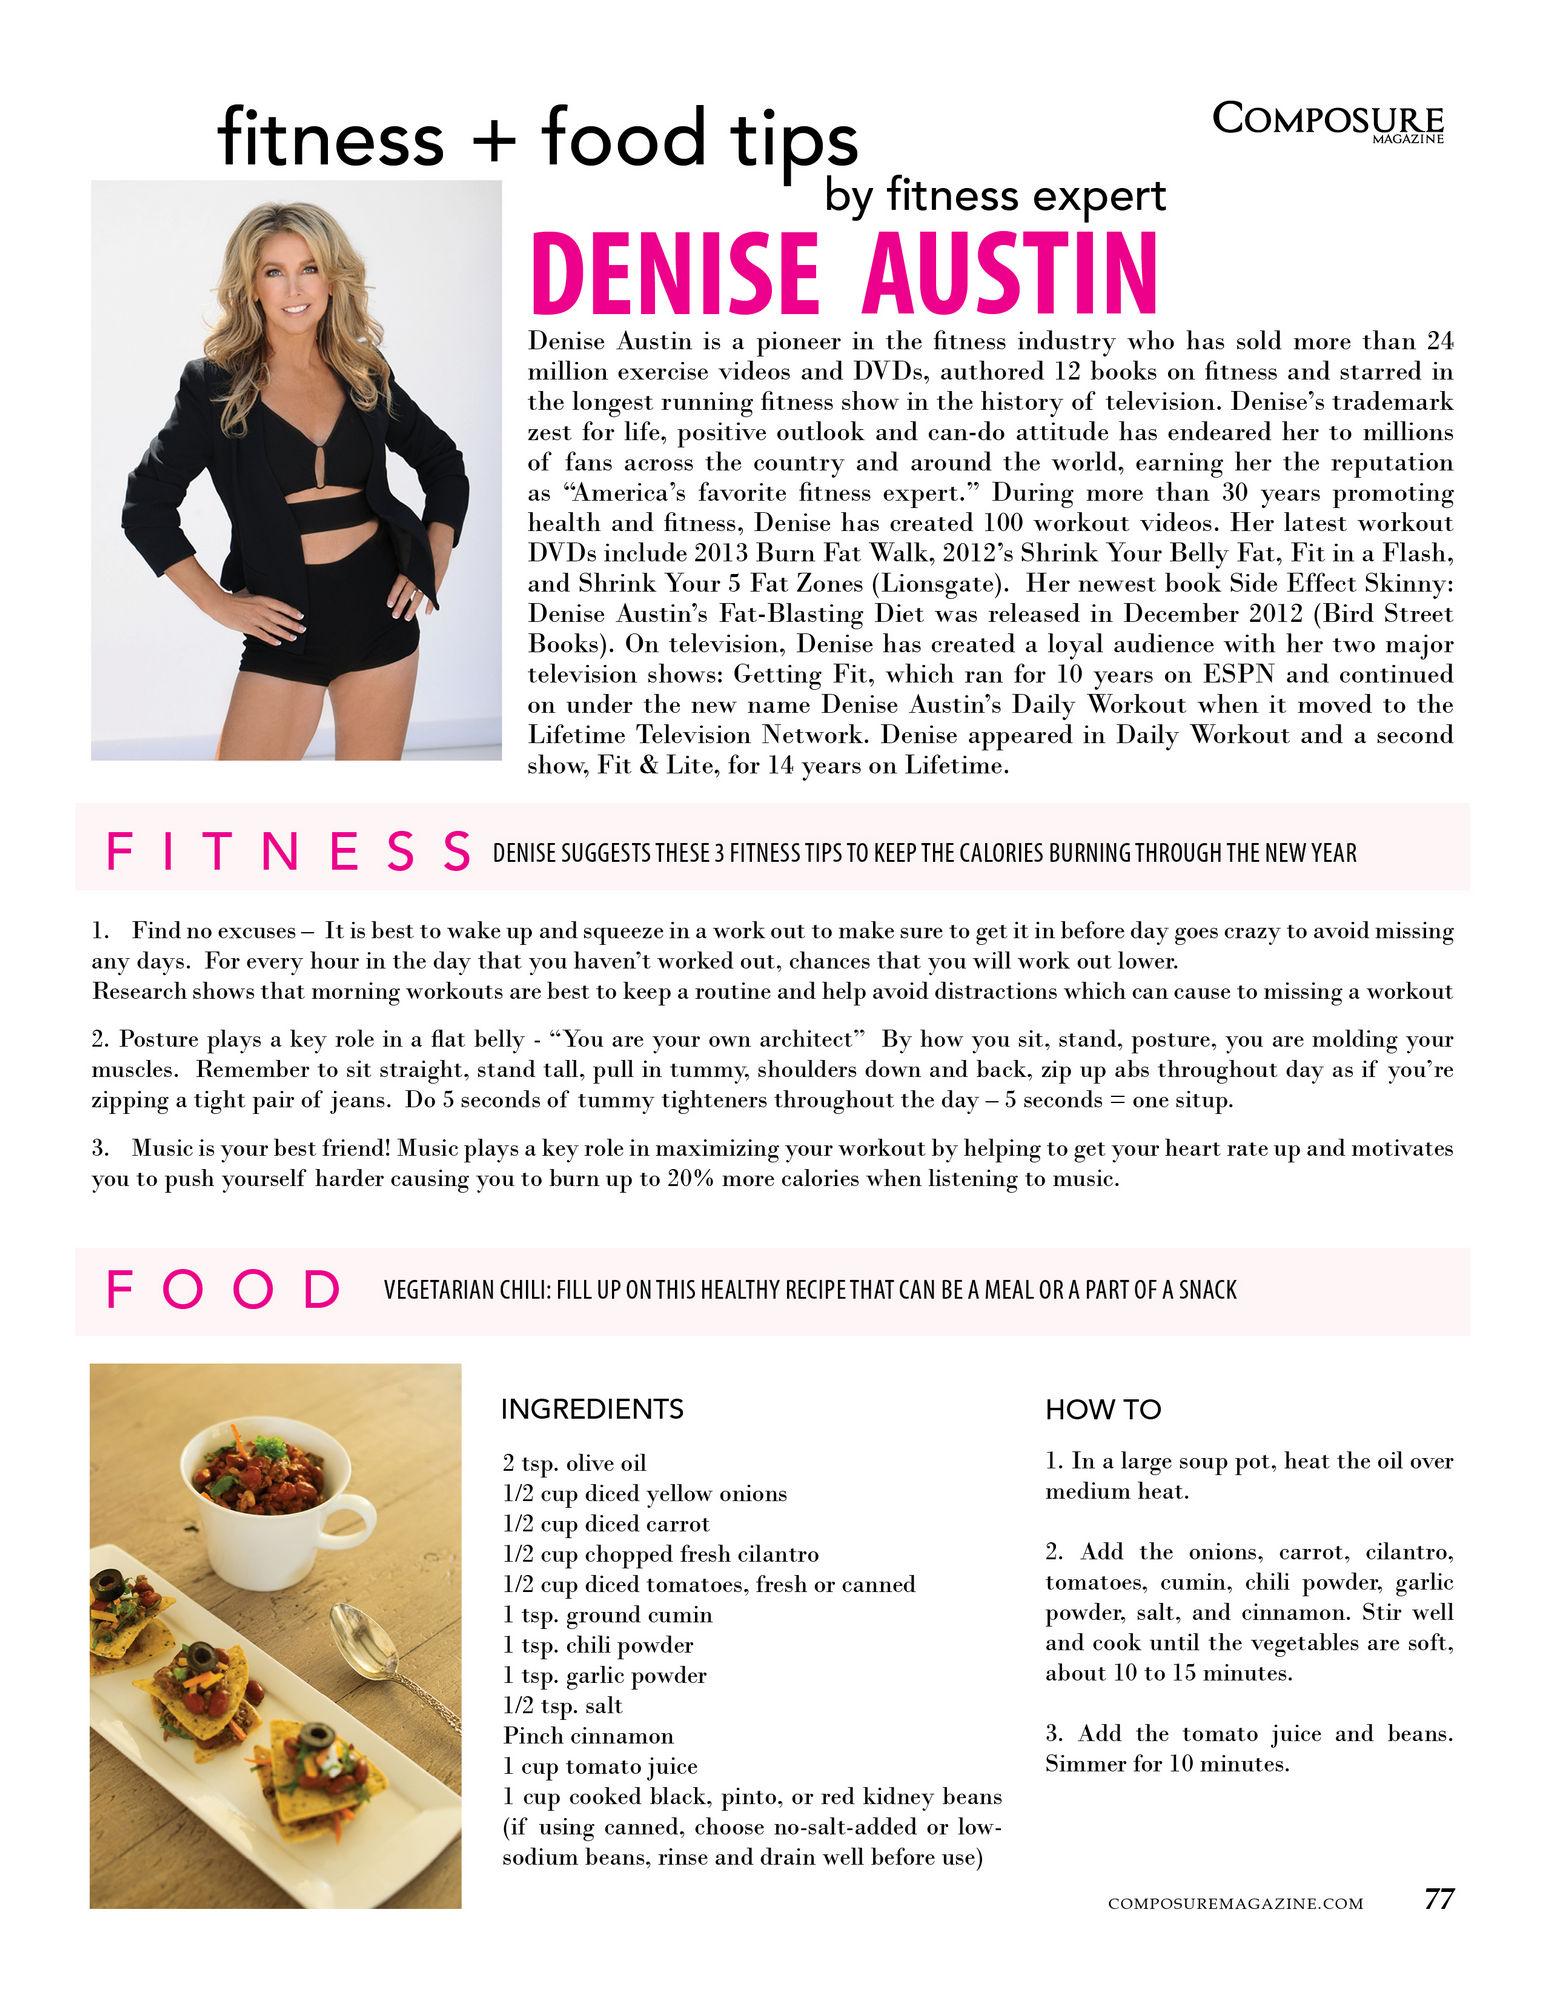 Fitness + Food Tips by fitness expert Denise Austin